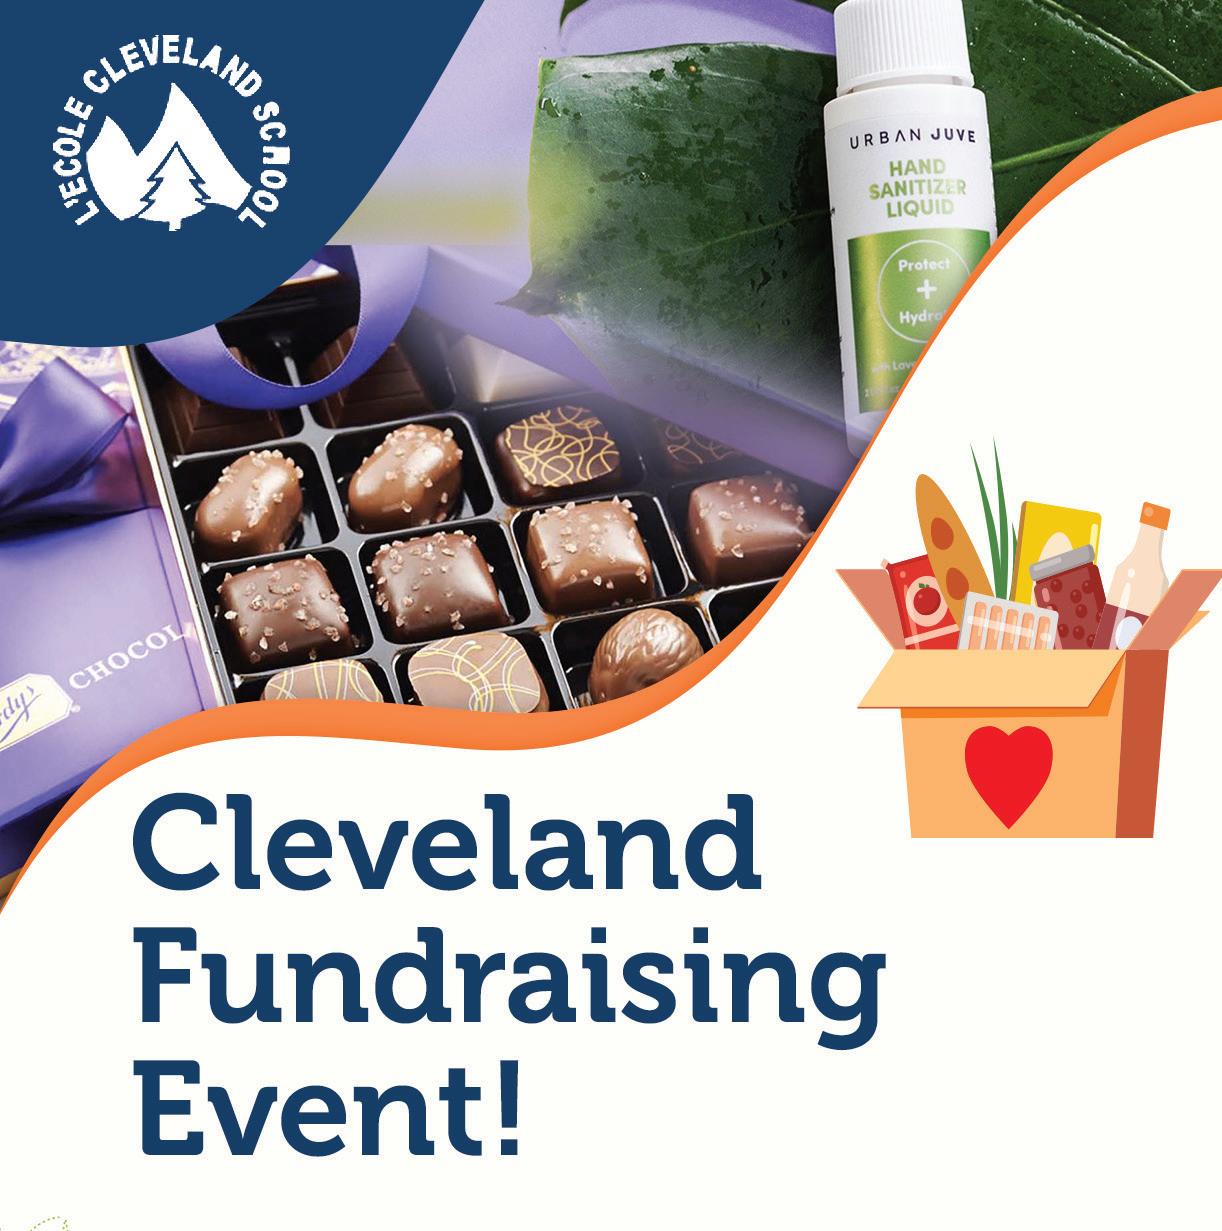 Cleveland Fundrasing Event!